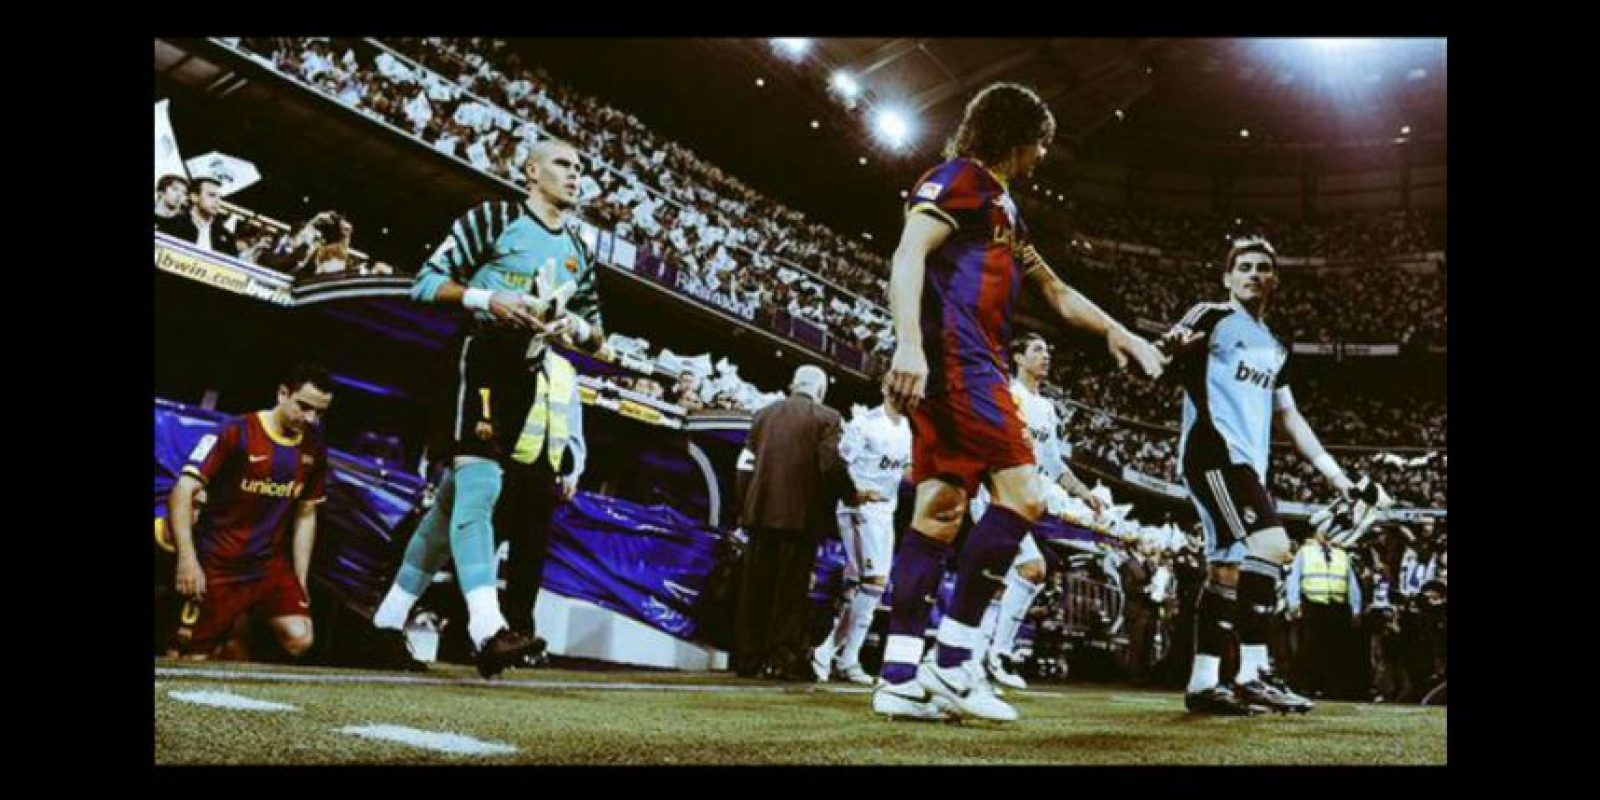 3. Carles Puyol Foto:Vía twitter.com/carles5puyol